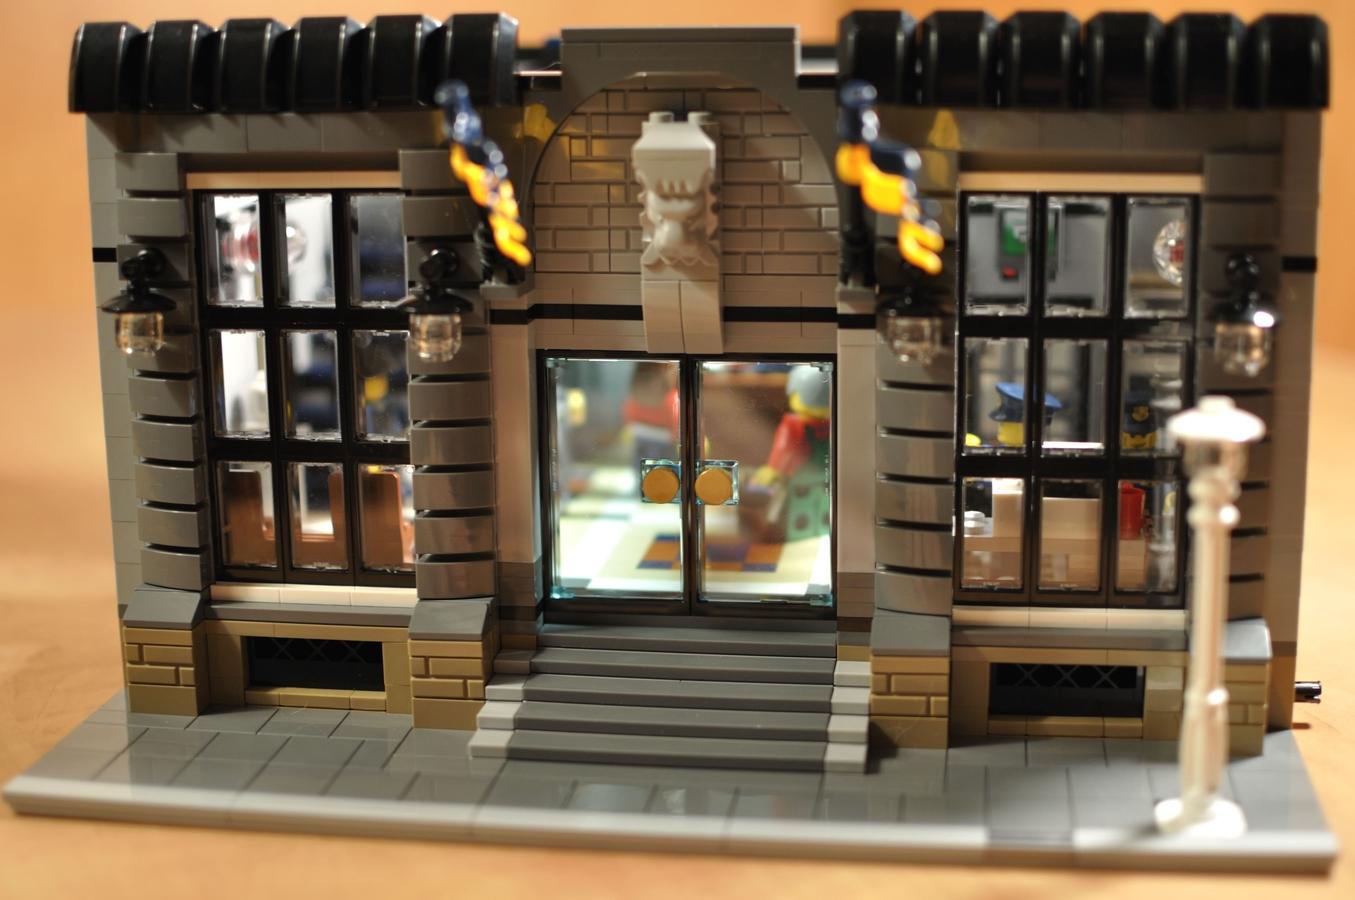 Lego Ideas Product Police Headquarters Modular Building 7744